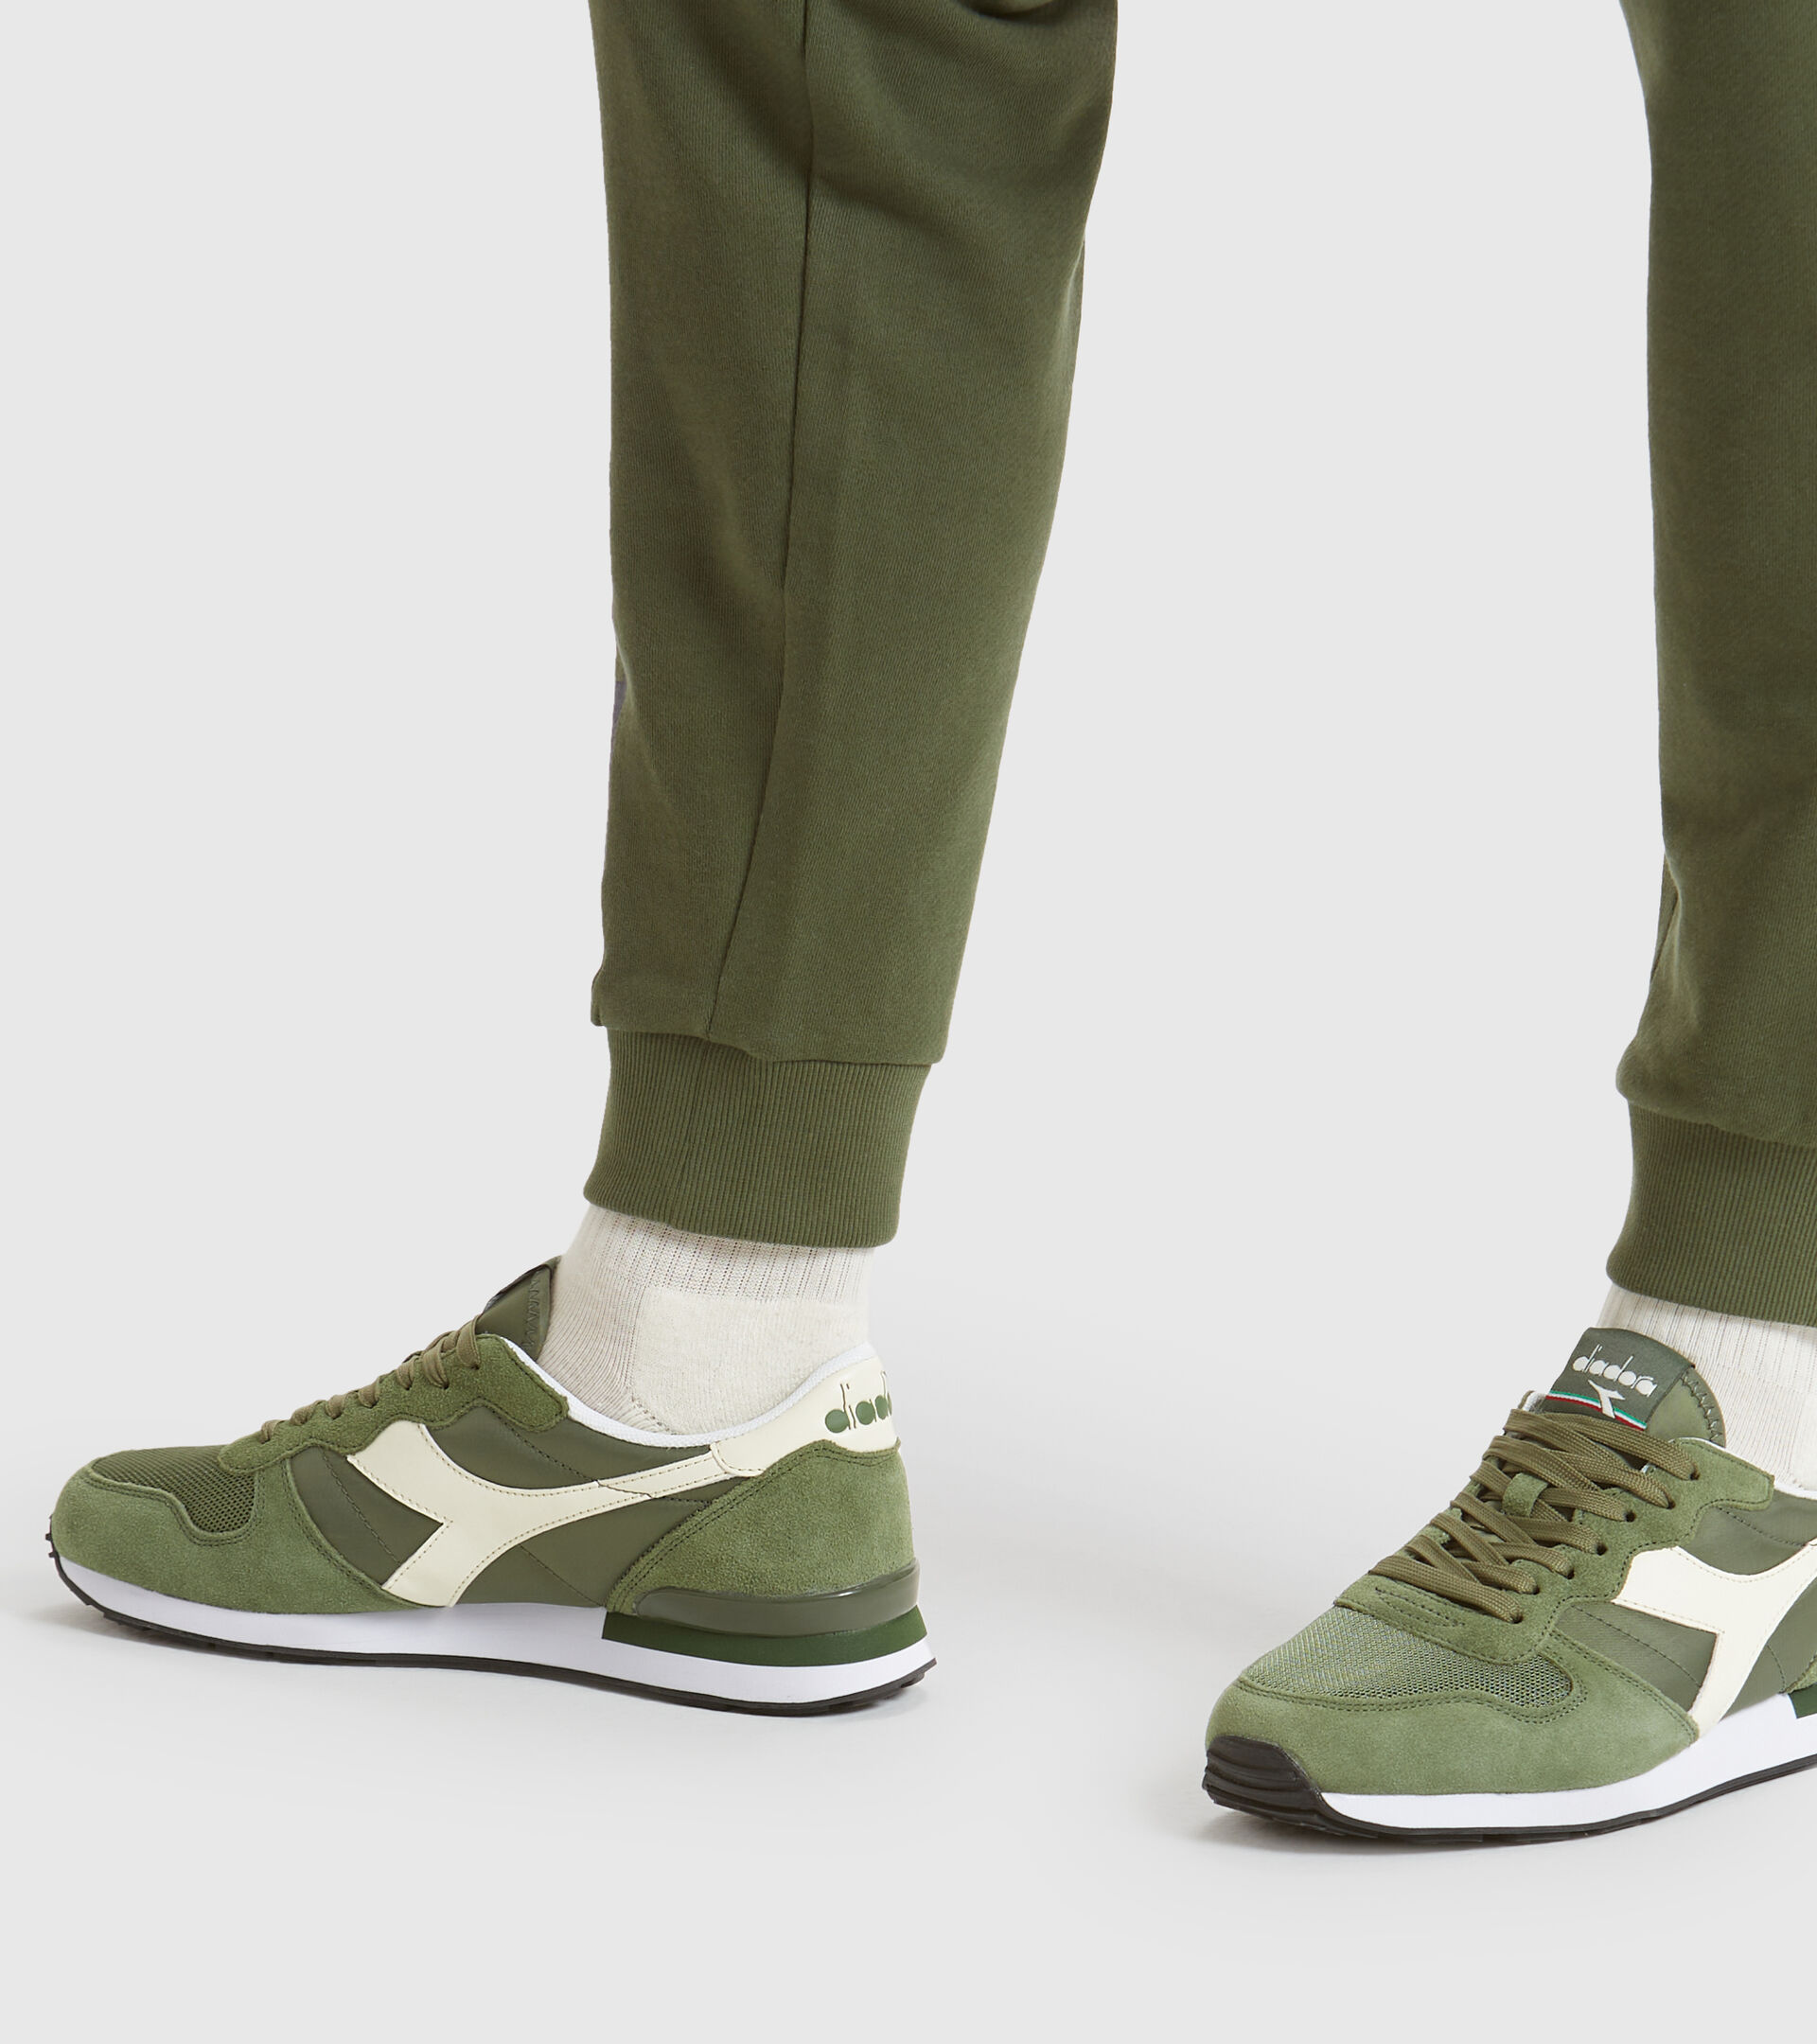 Footwear Sportswear UNISEX CAMARO VERDE OLIVINO/BLANCO SUSPIRO Diadora